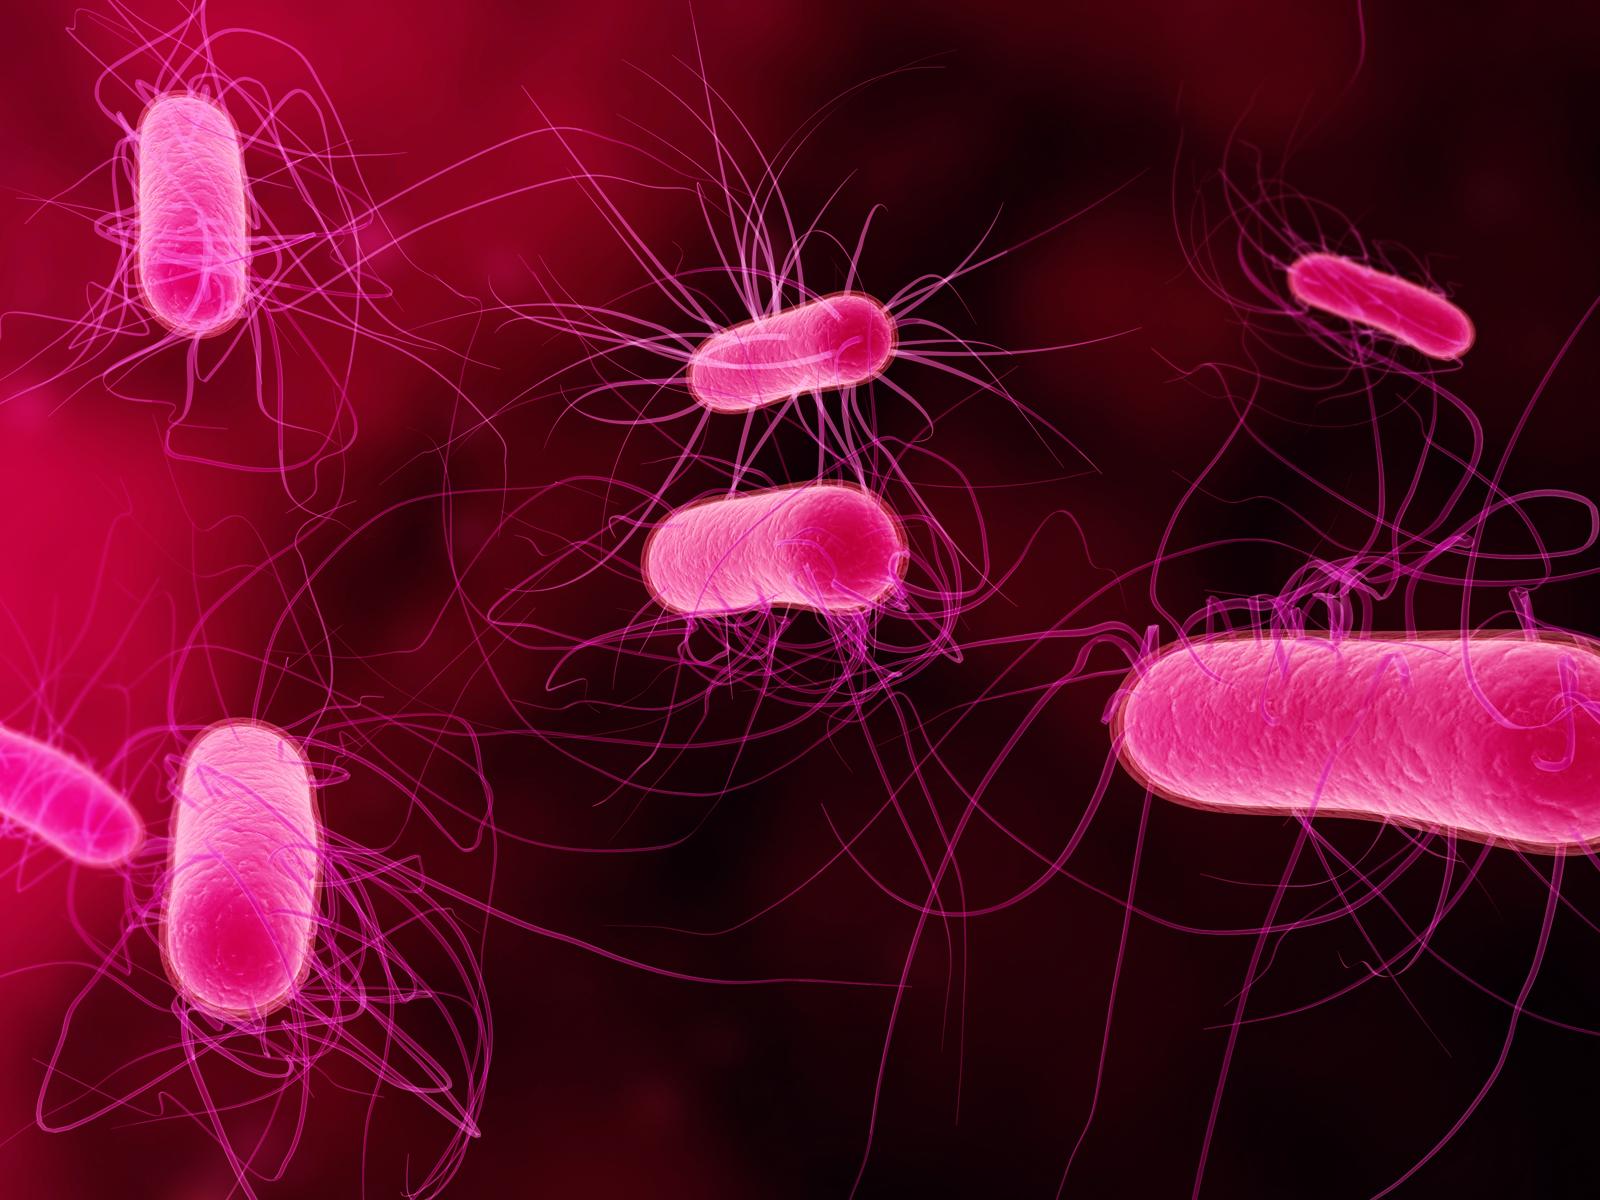 Bacterias en 3D.